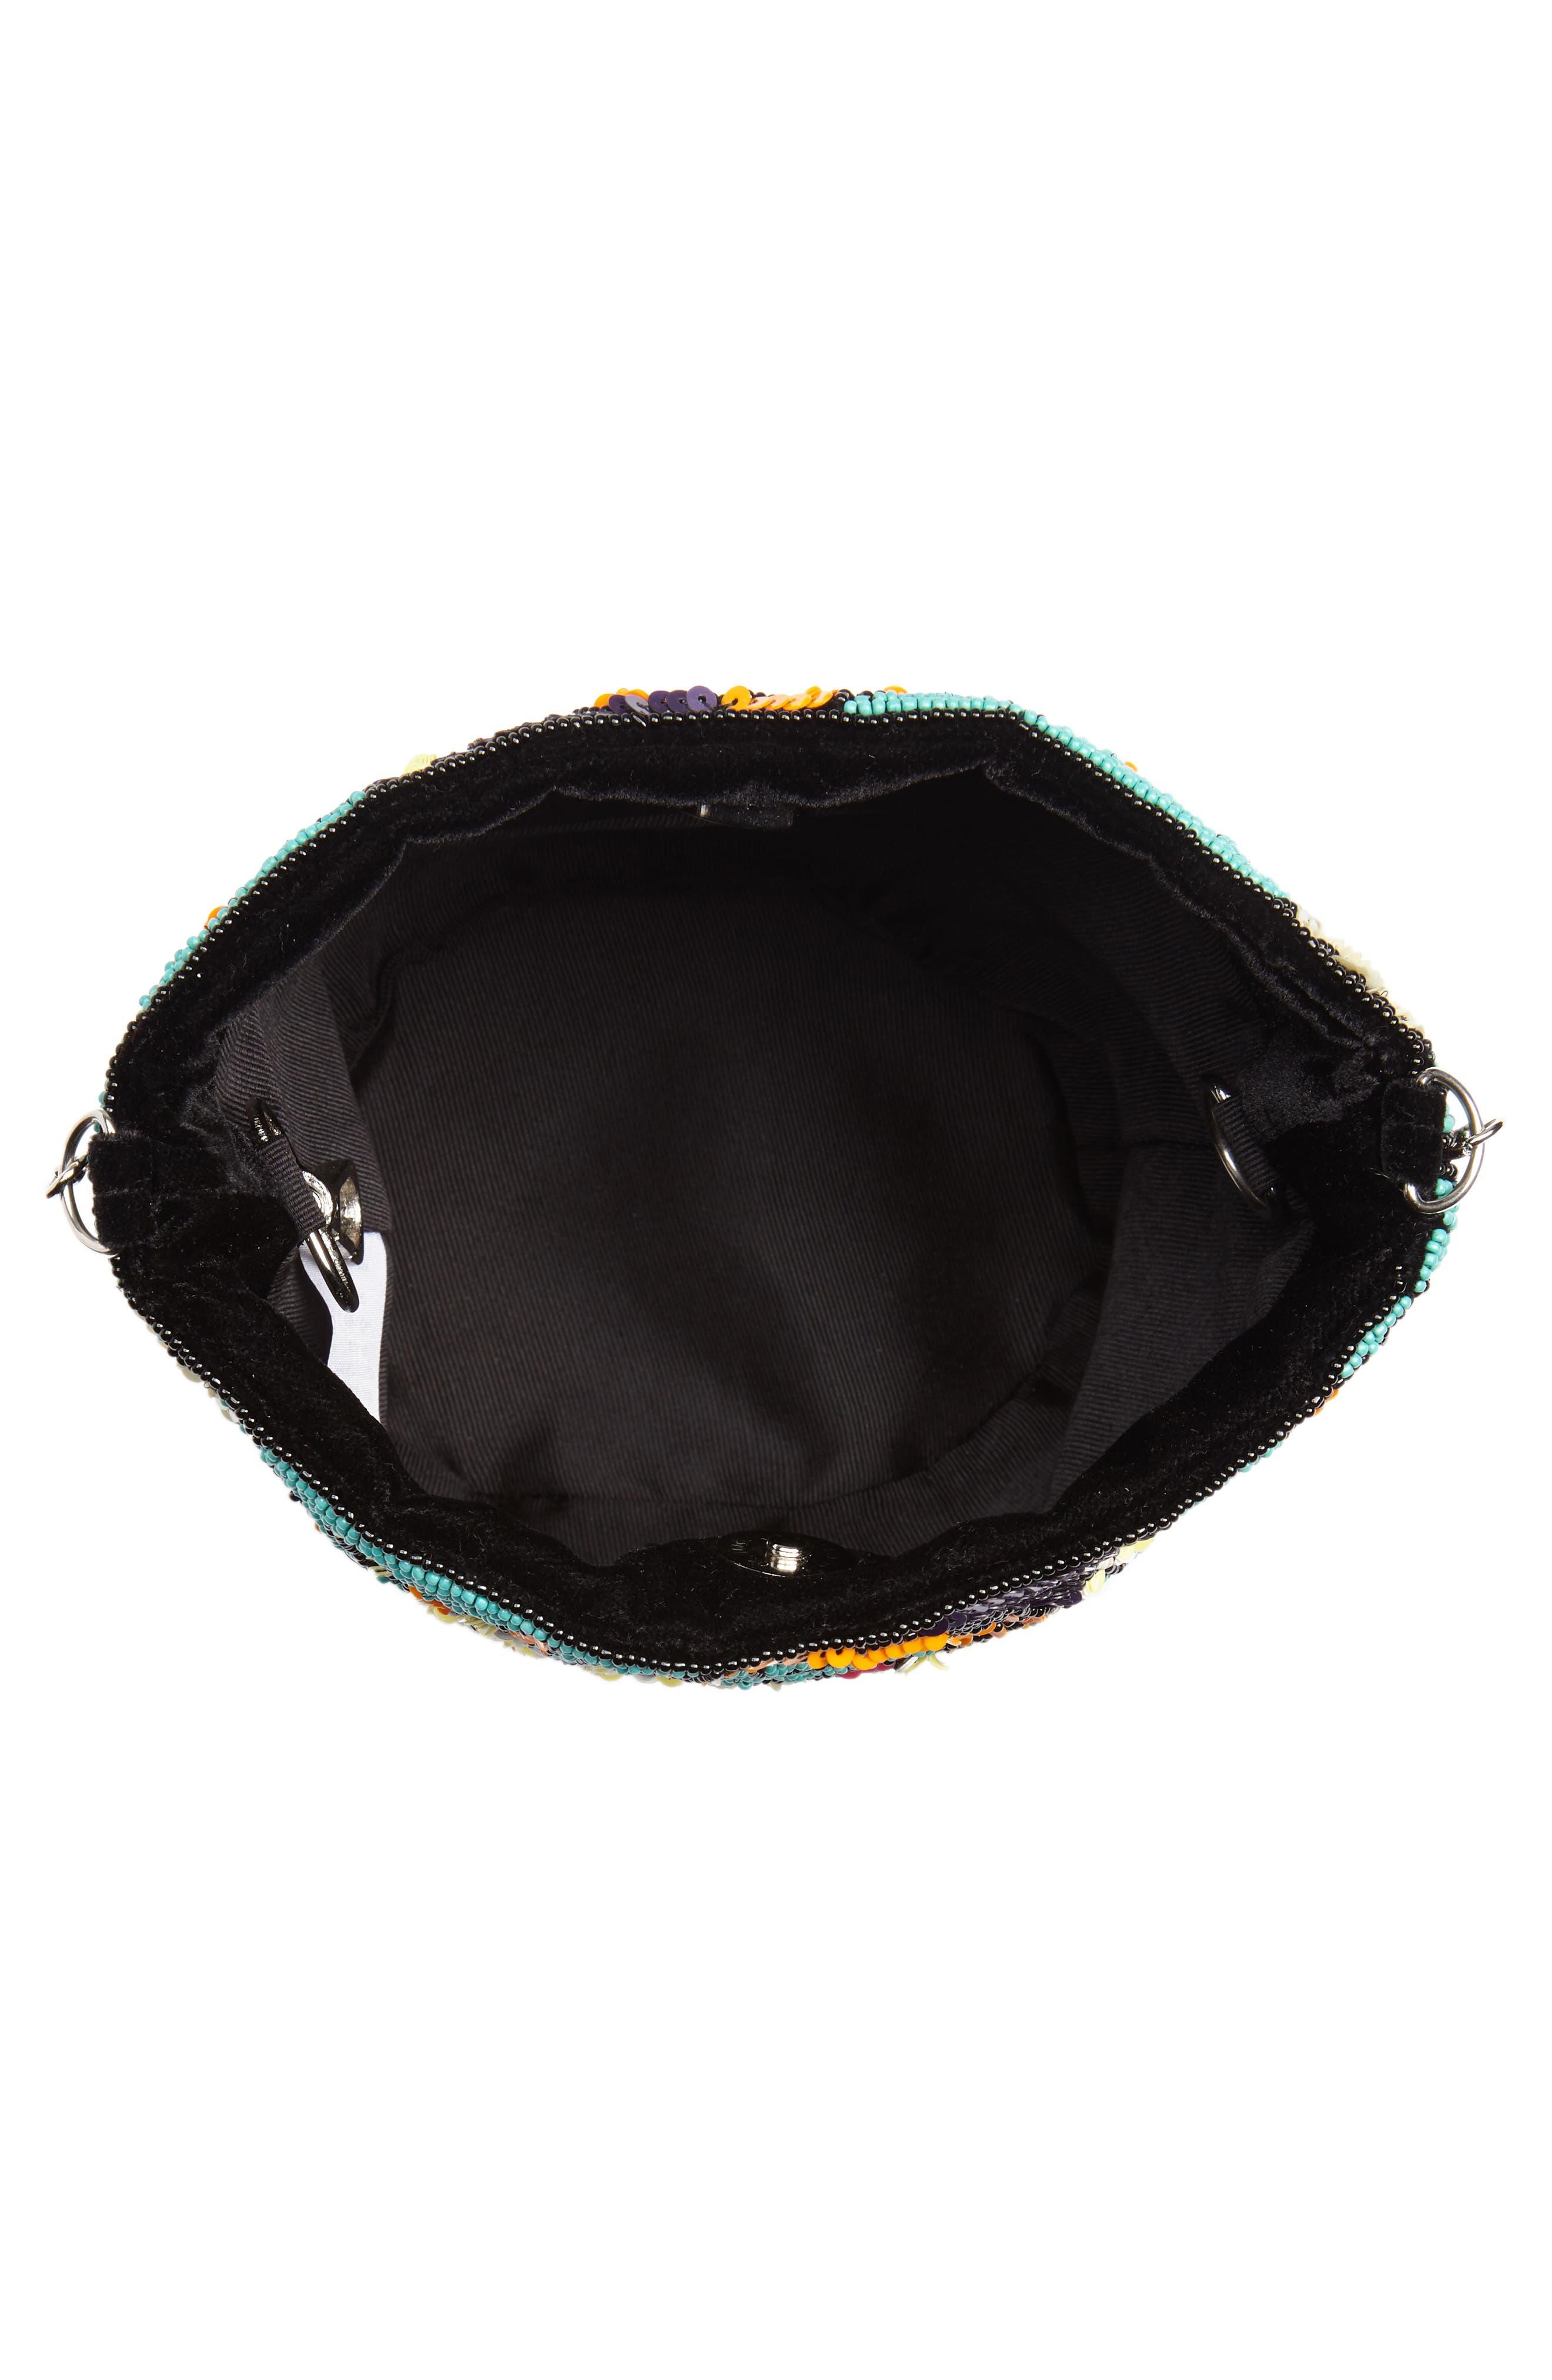 Kipp Beaded Shoulder Bag,                             Alternate thumbnail 4, color,                             Black Multi